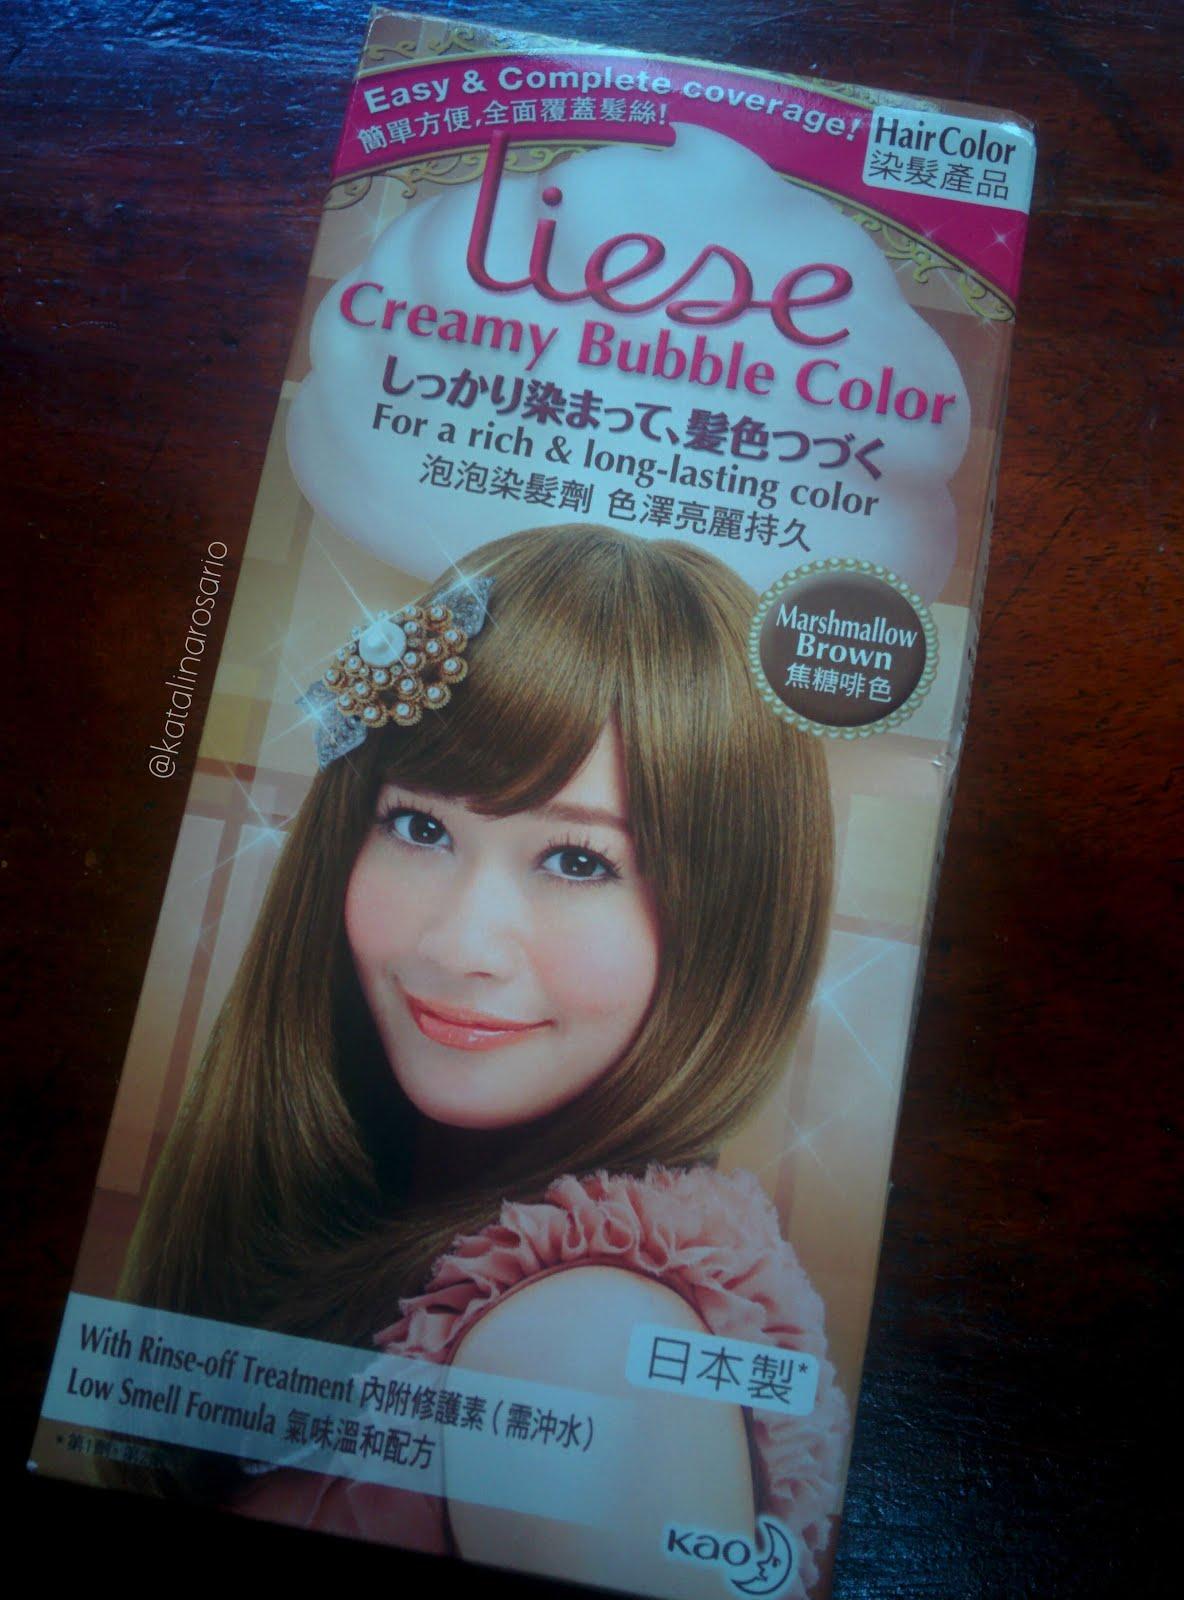 Liese Diy Hair Color As Easy As Shampoo Kaths Journey